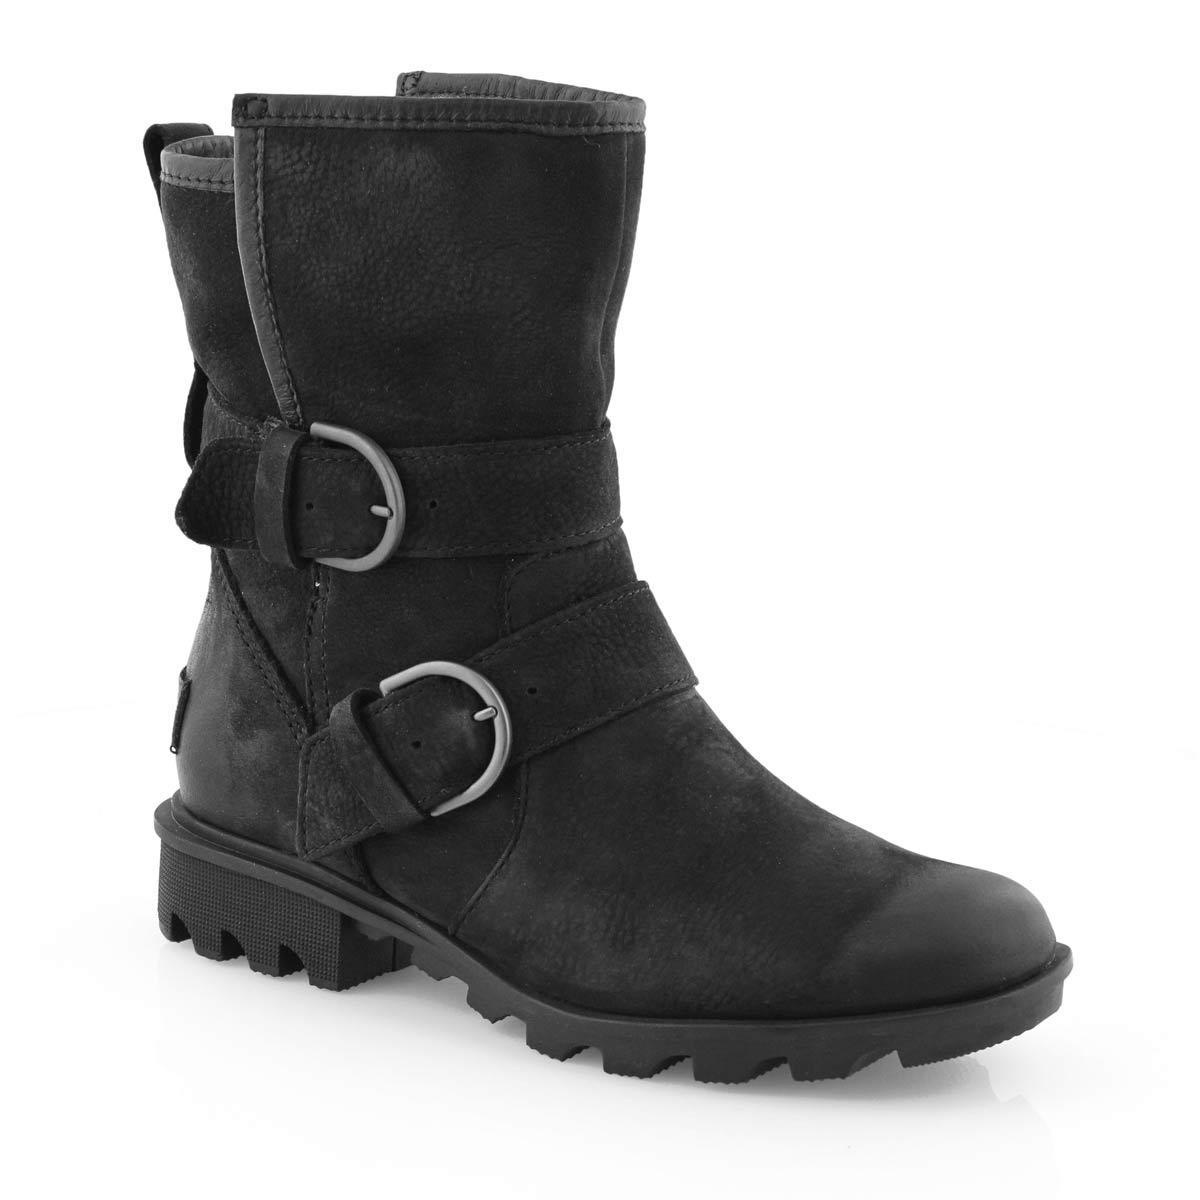 Lds Phoenix Moto Cozy black wtpf boot